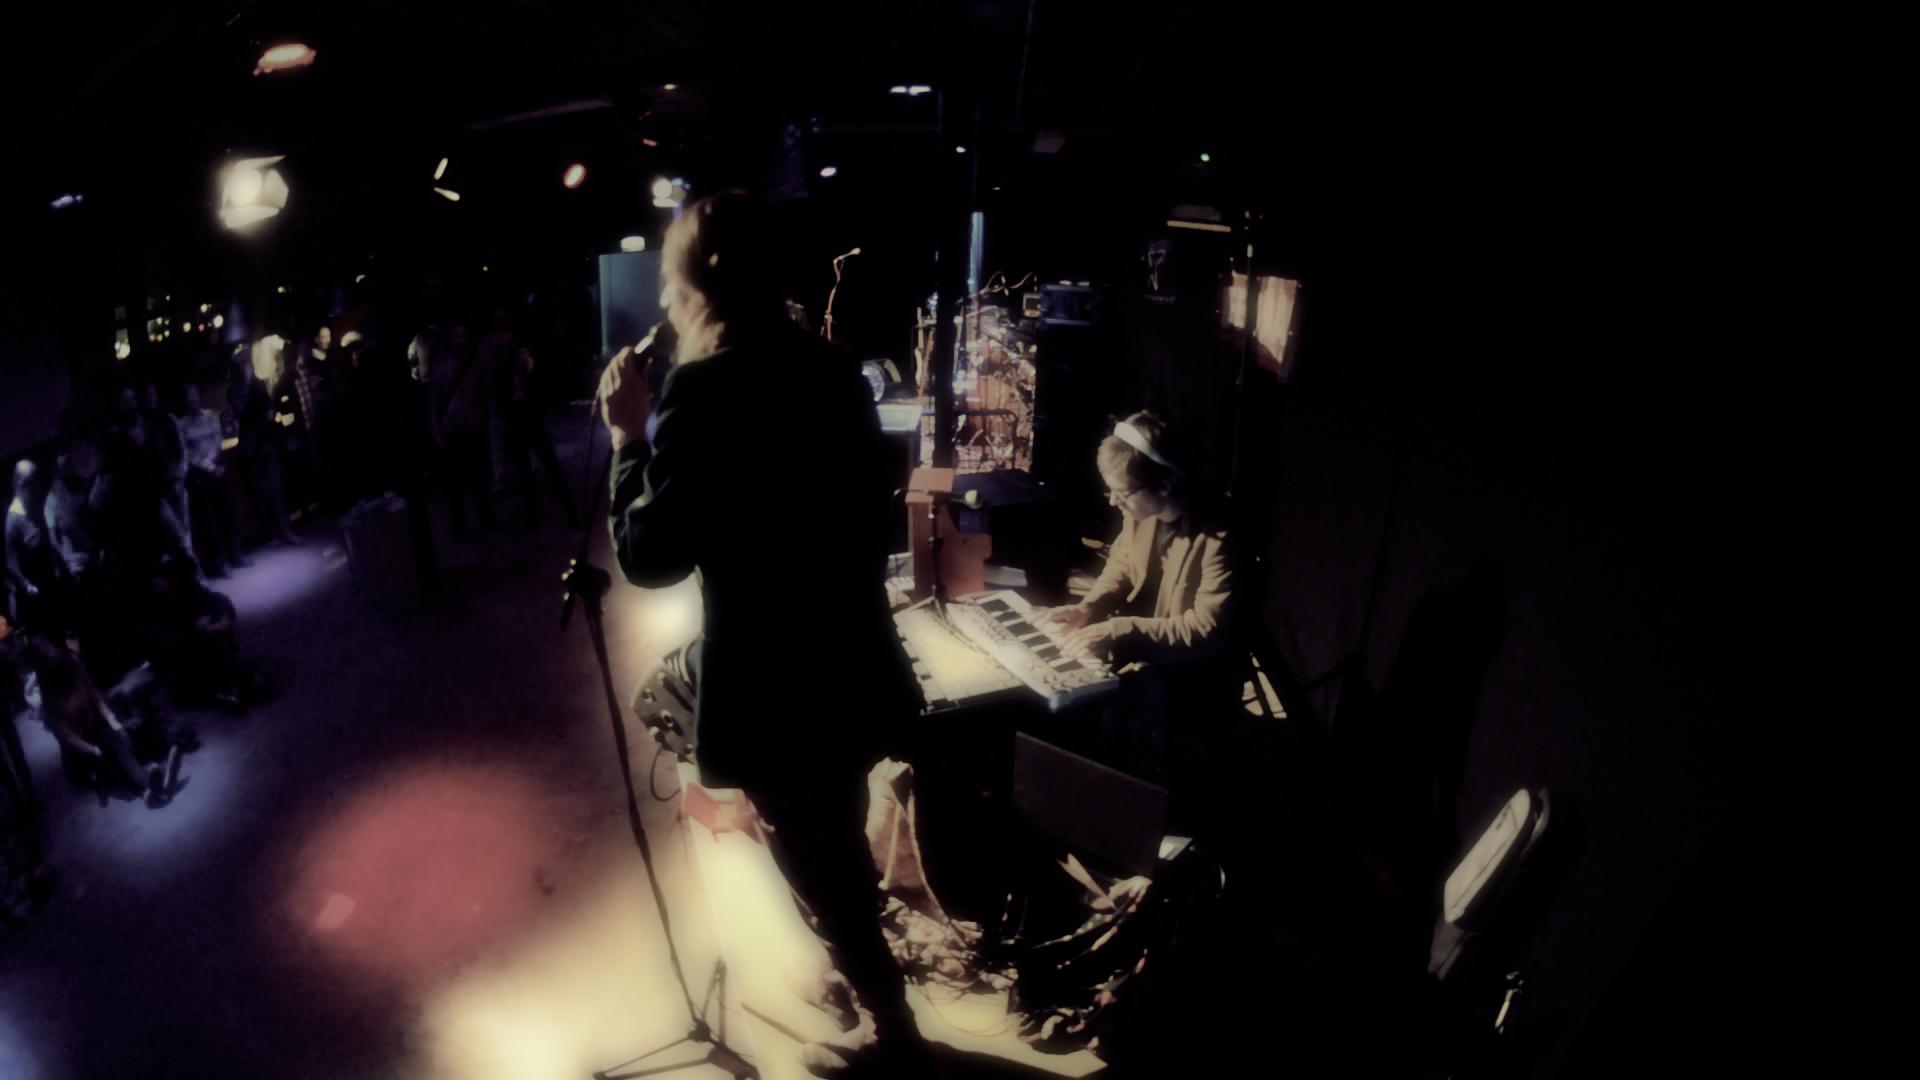 IkEgo live @ BrakkeBoeken (acoustic)